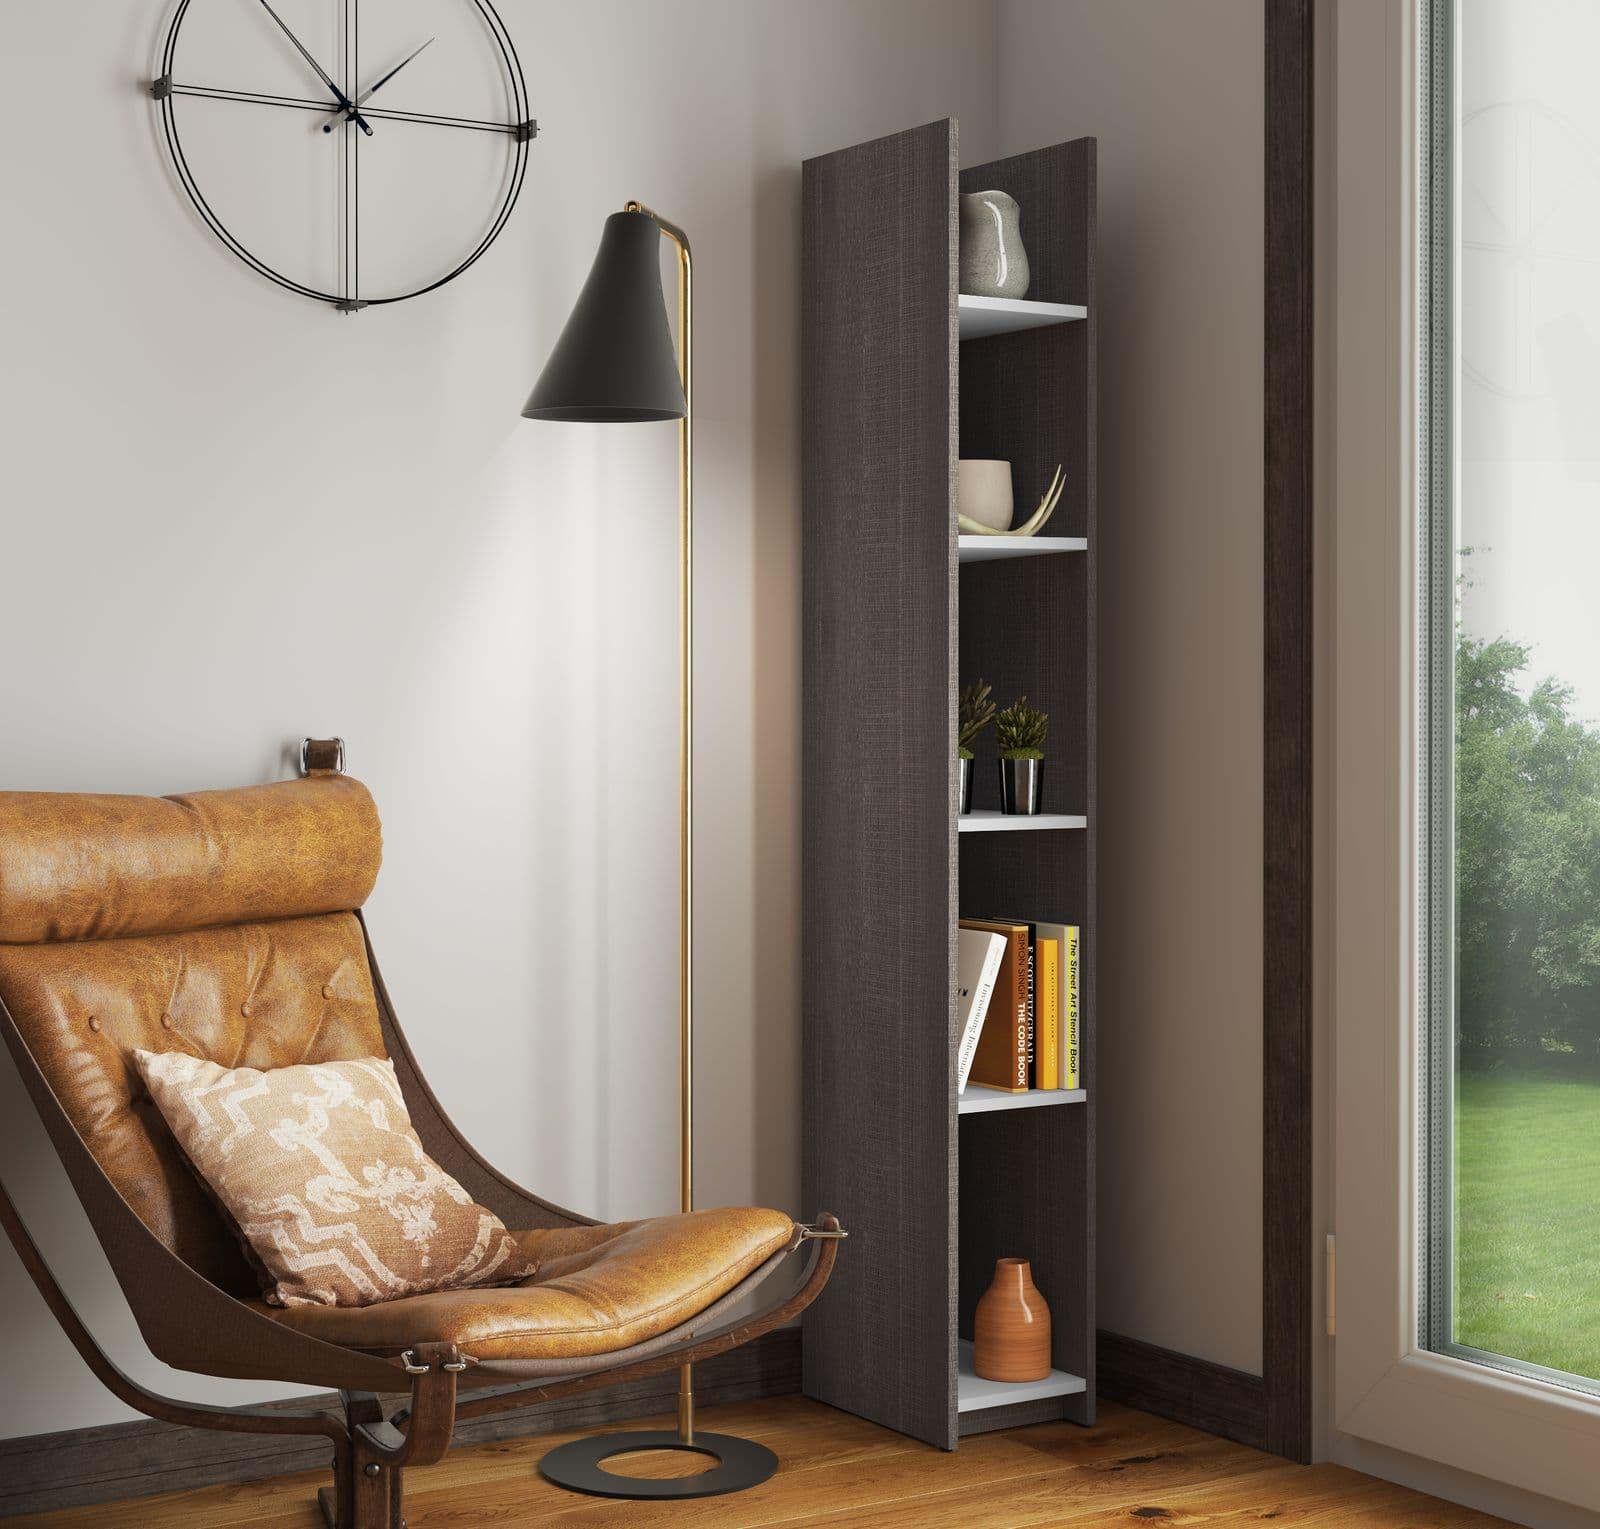 Bestar narrow shelving unit in a corner